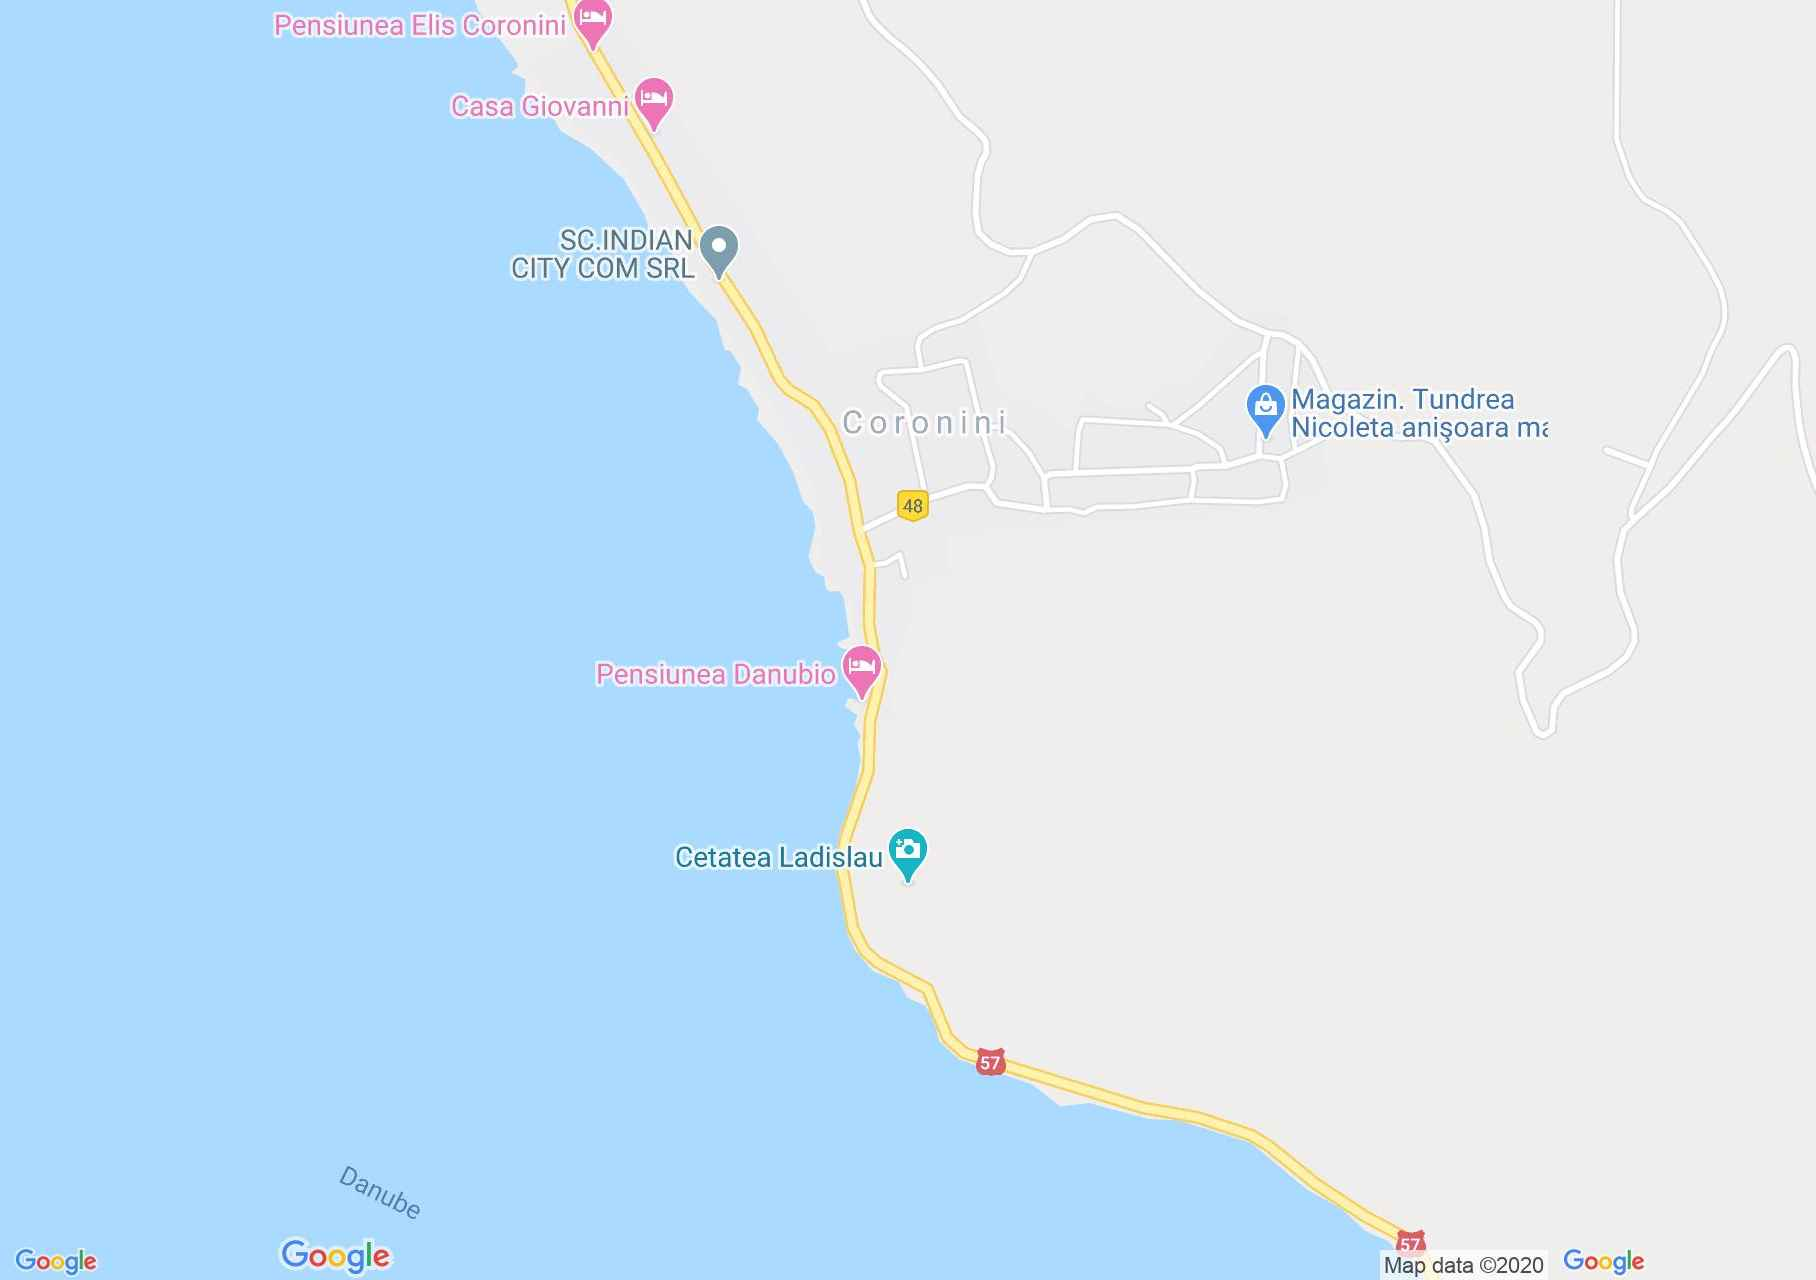 Coronini, Harta turistică interactivă